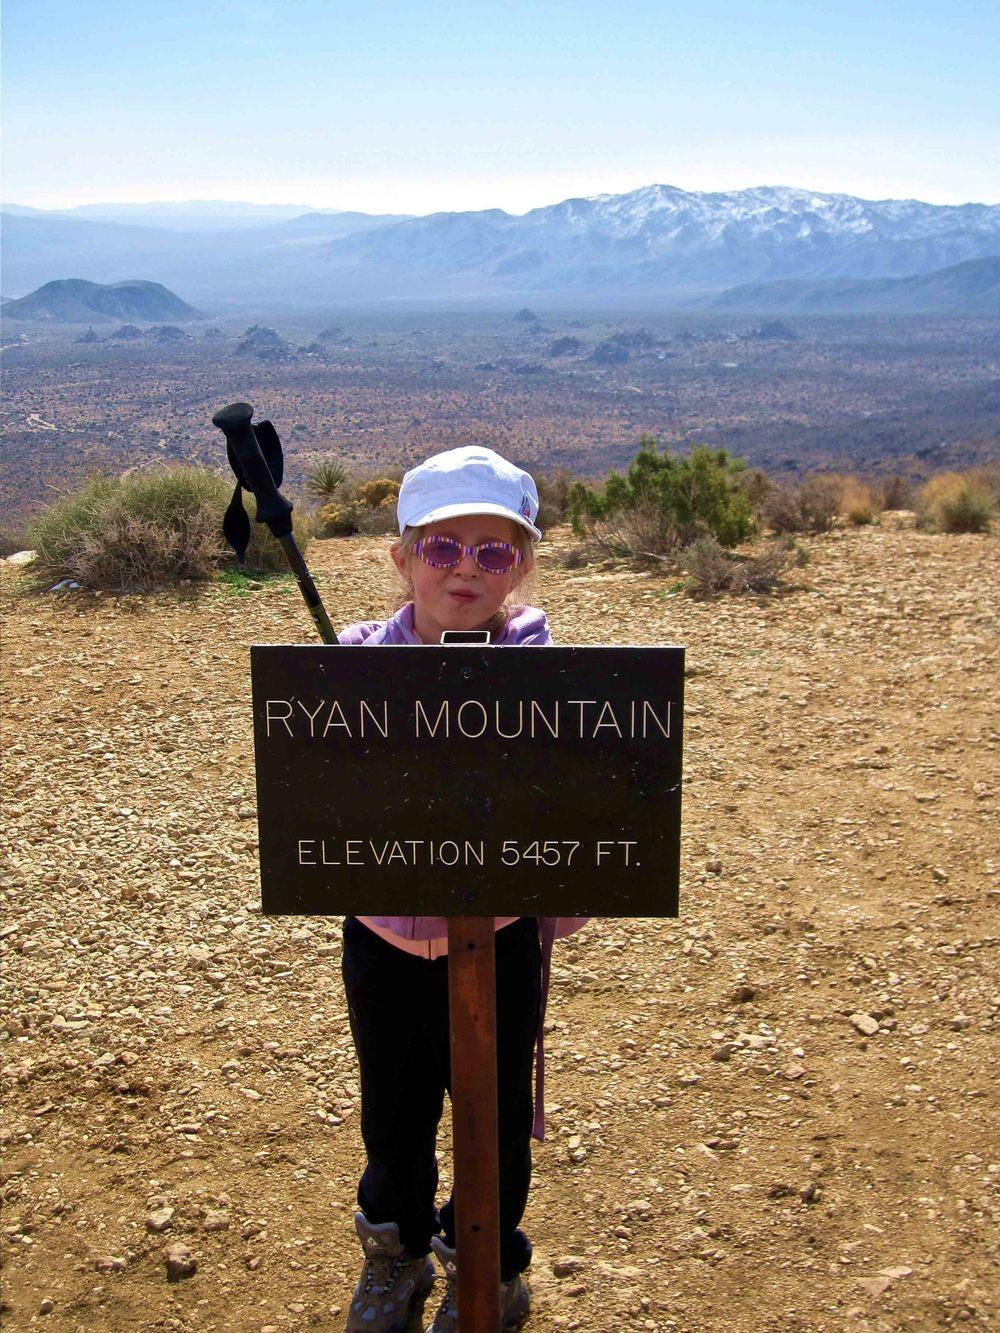 Angela's first mountain, Ryan Mountain, Joshua Tree National Park, California, February 2009